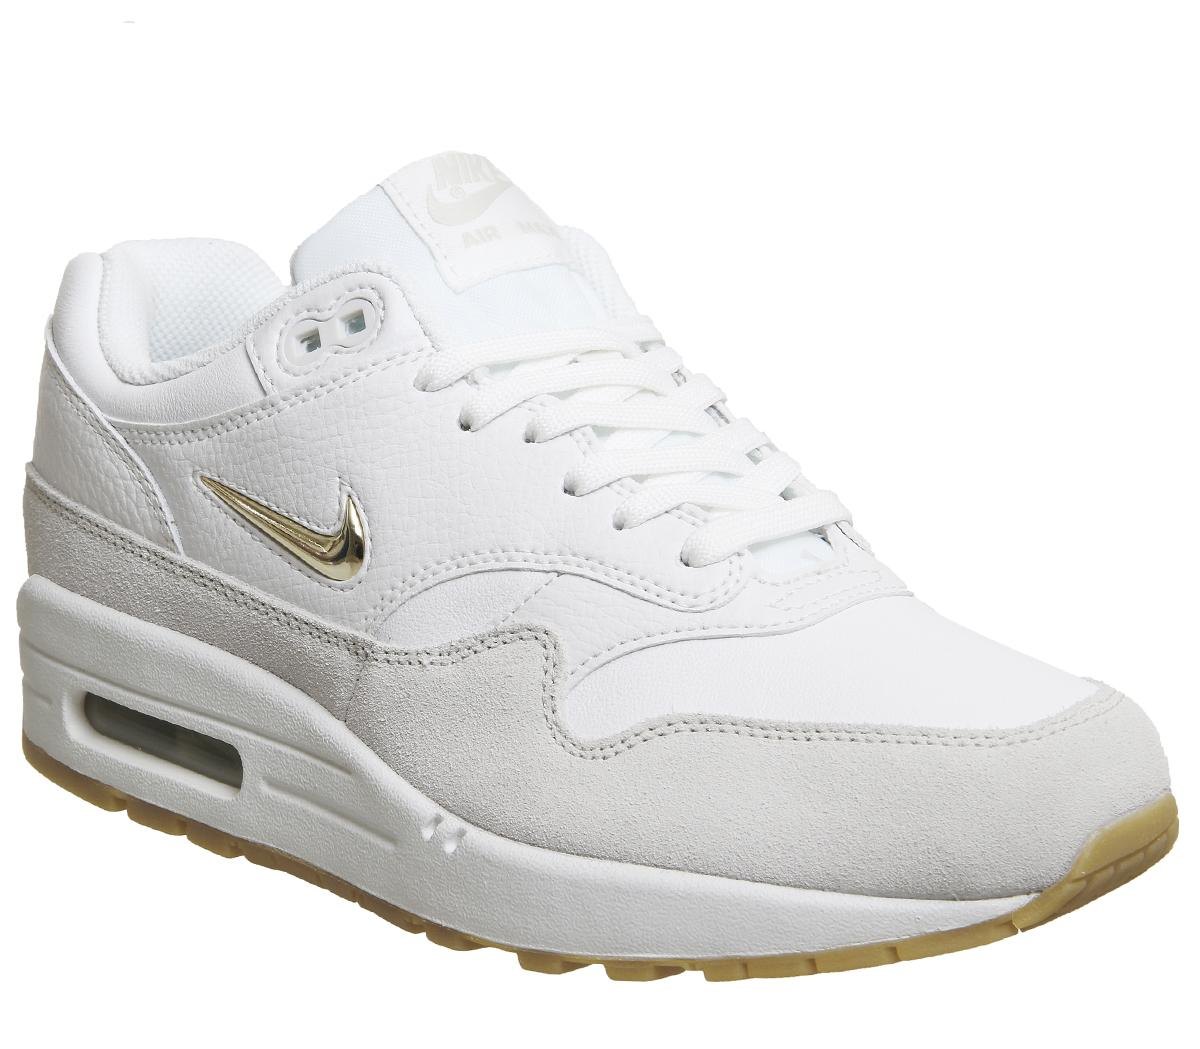 Nike Air Max 1 Jewel Summit White